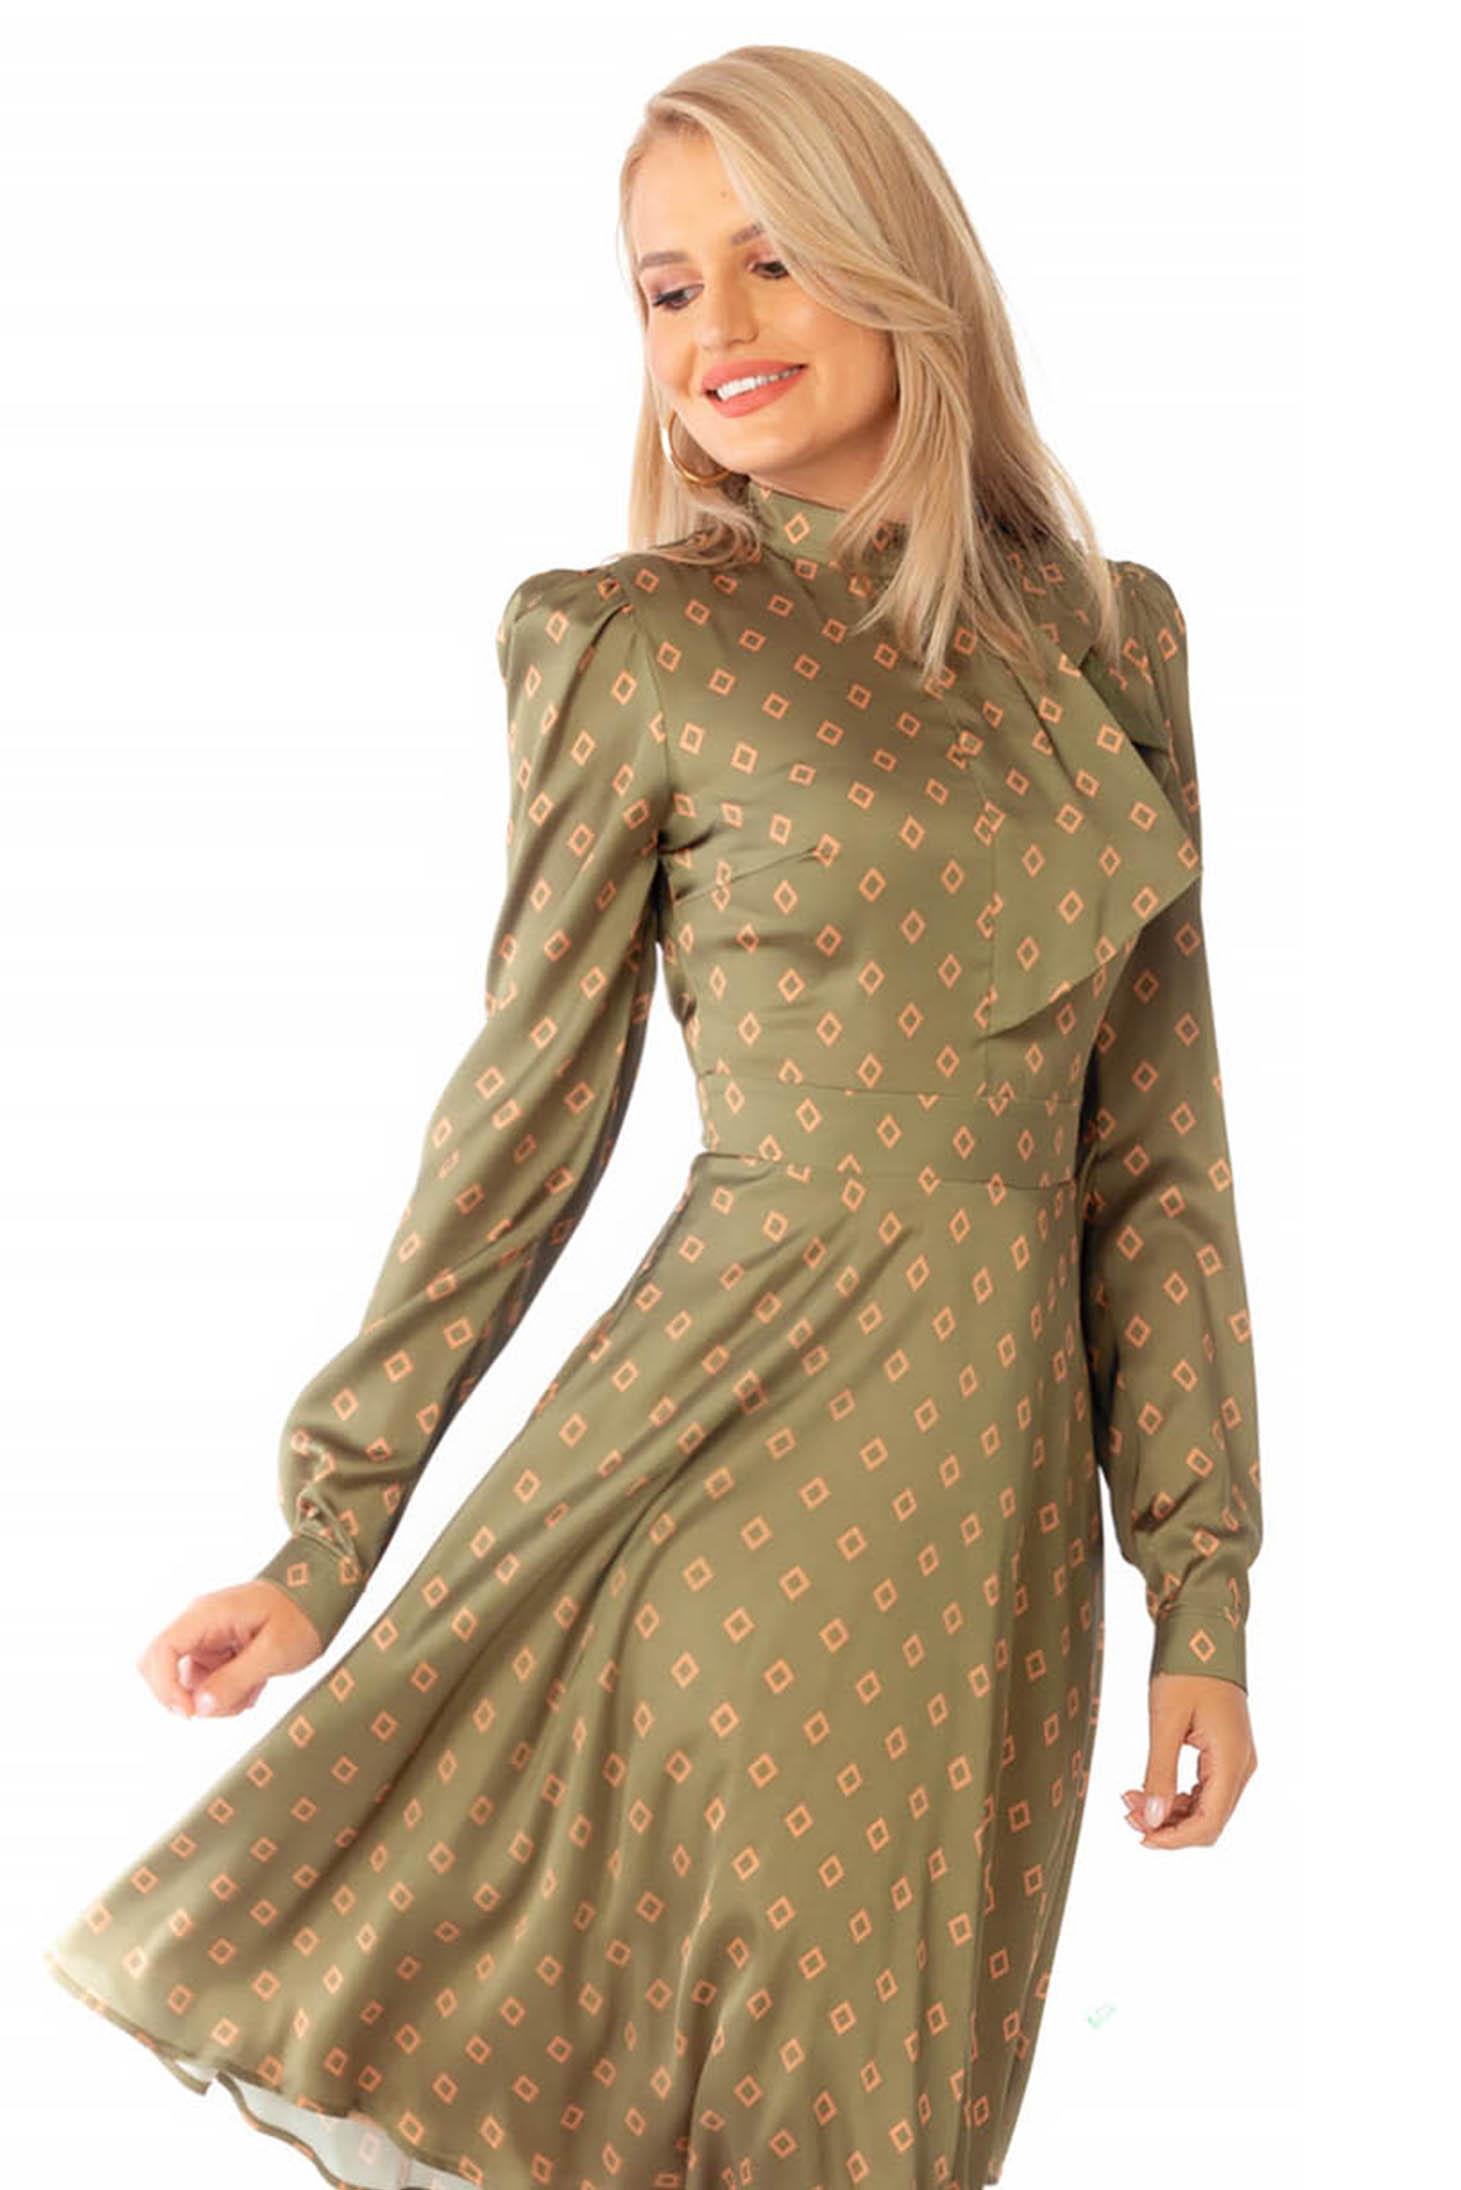 Dress khaki elegant cloche from satin fabric texture with geometrical print